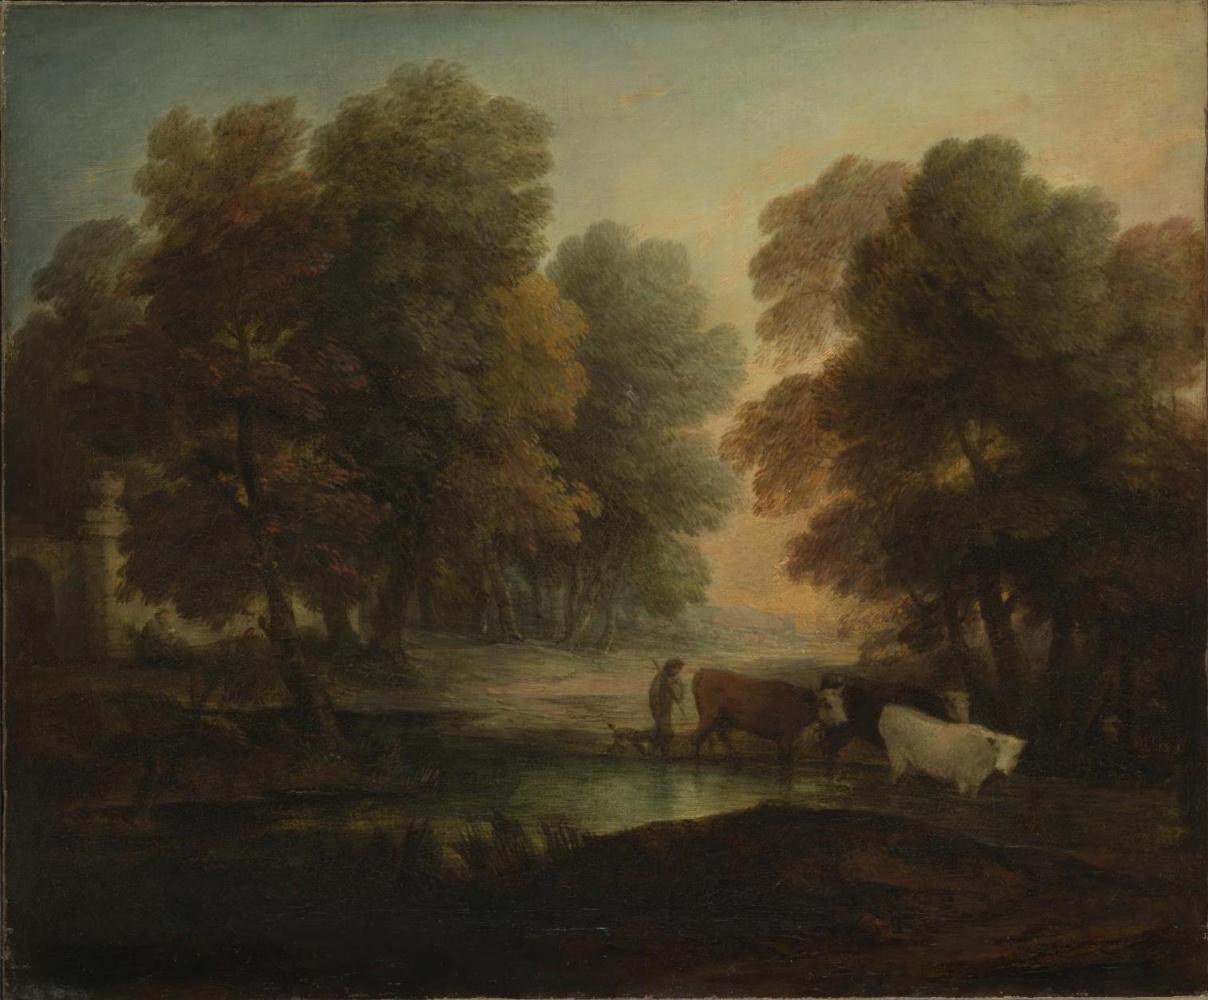 Thomas Gainsborough. A shepherd boy with cows near the pond